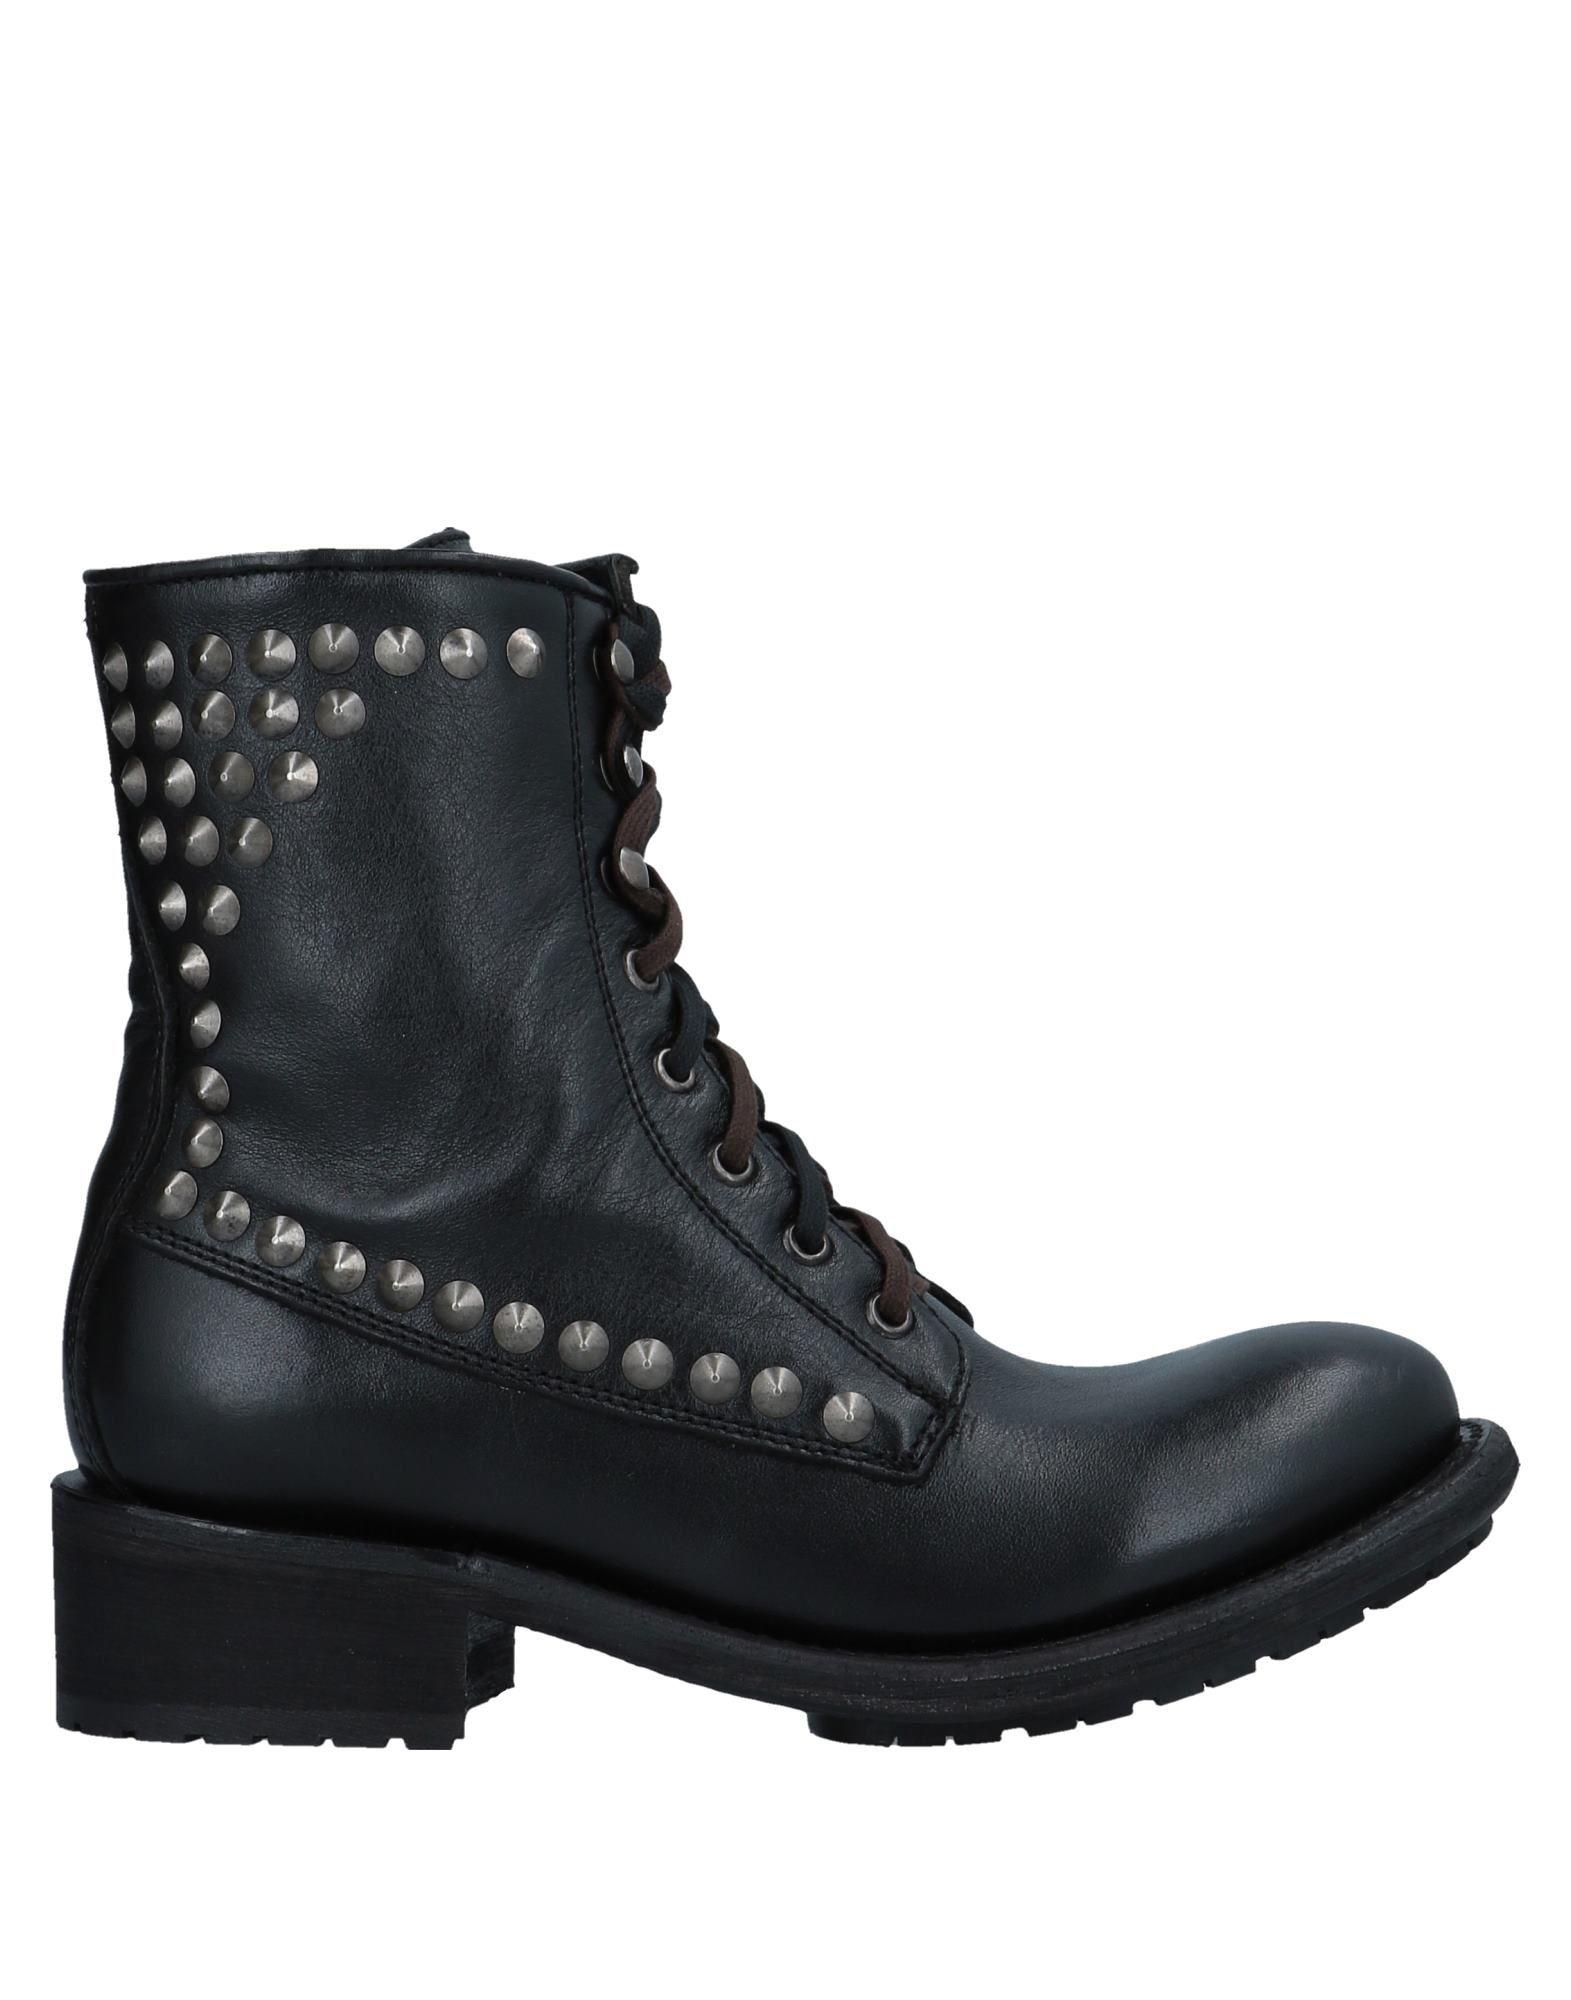 Stilvolle billige Stiefelette Schuhe Ash Stiefelette billige Damen  11520039JJ 21c290